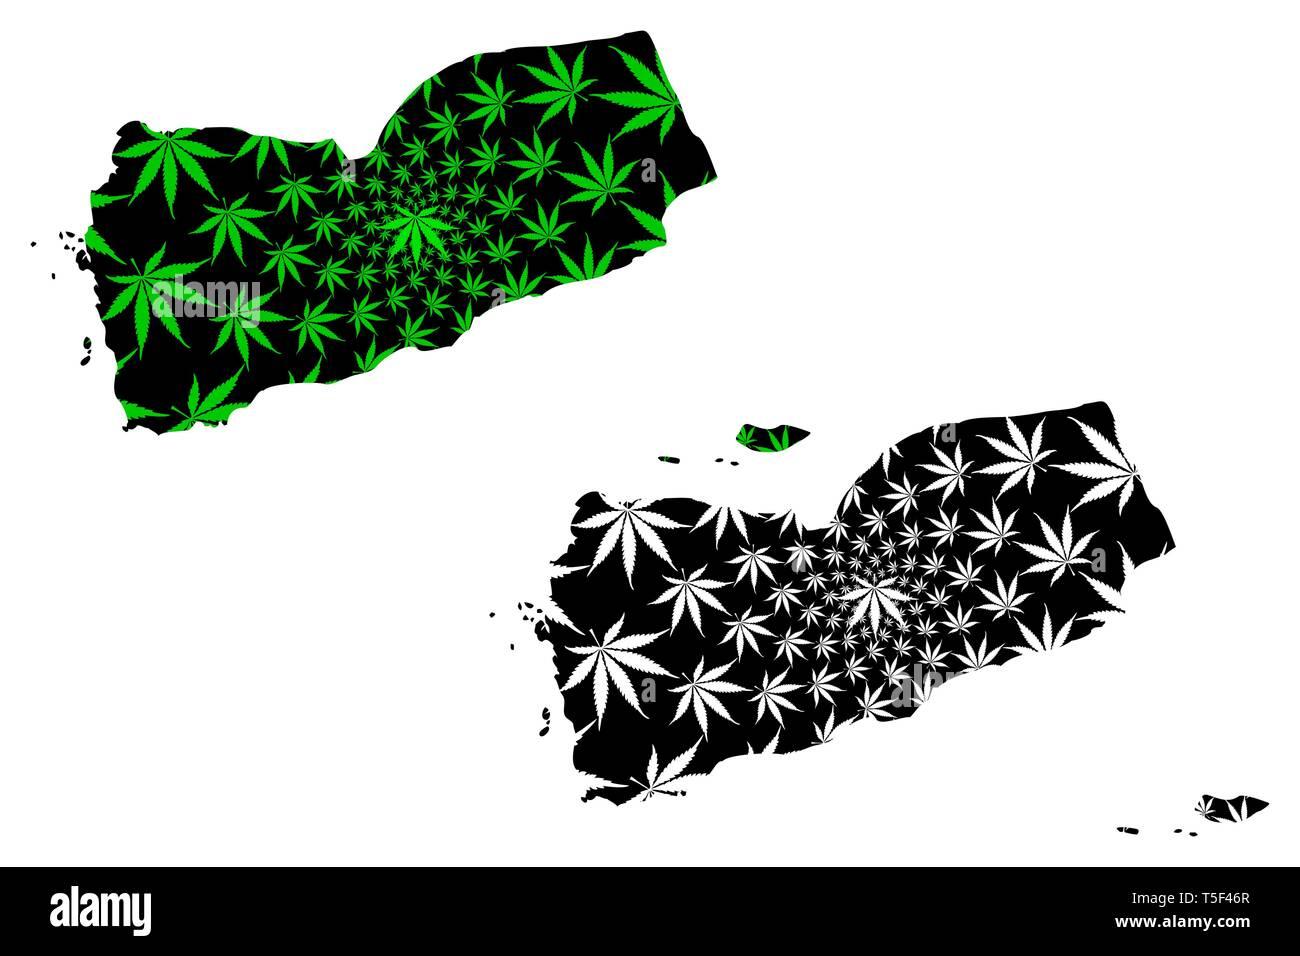 Yemen - map is designed cannabis leaf green and black, Republic of Yemen map made of marijuana (marihuana,THC) foliage, - Stock Vector